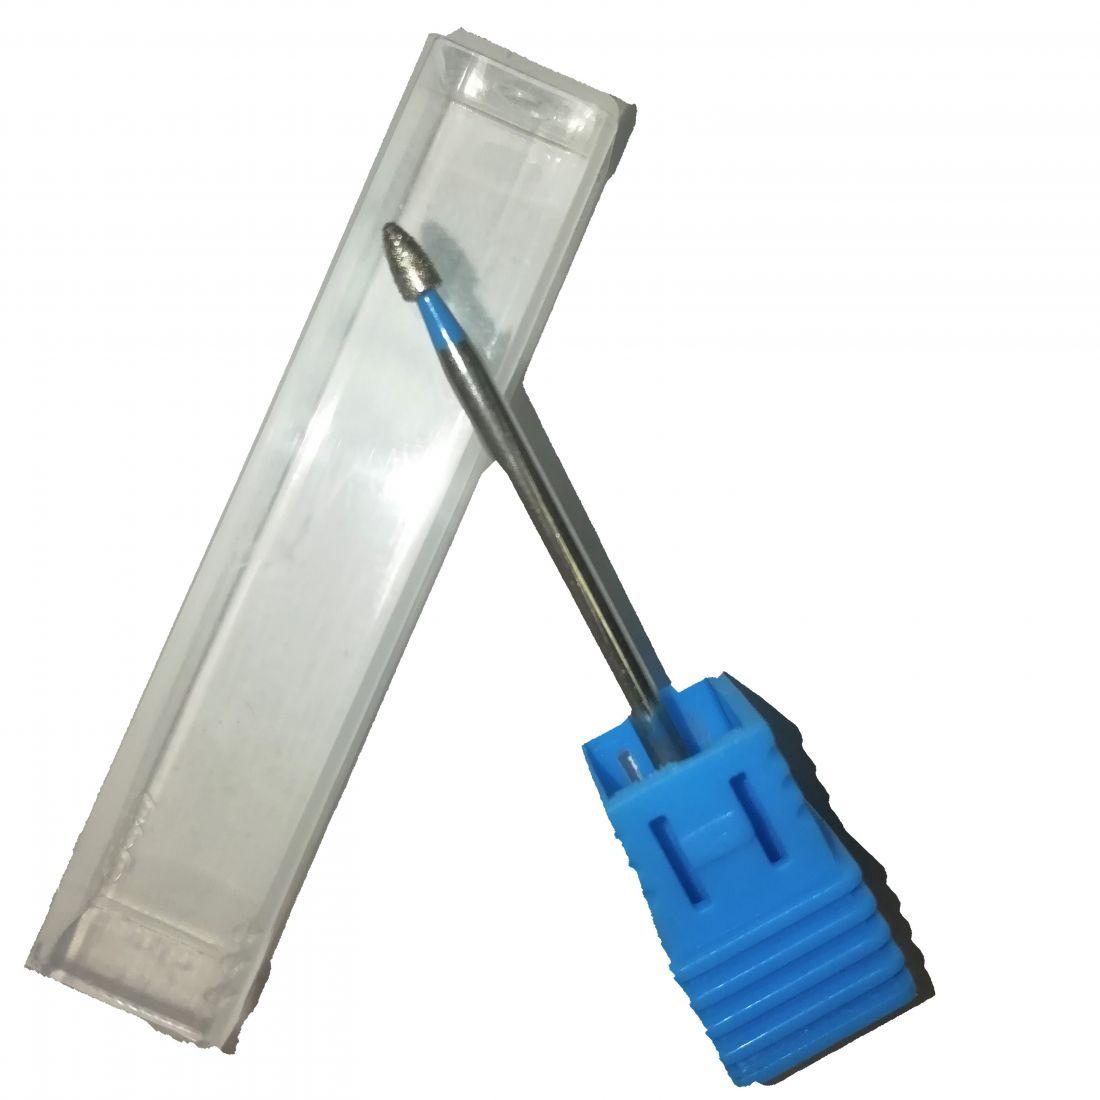 Алмазная фреза пулька синяя (2 мм) Арт. 81